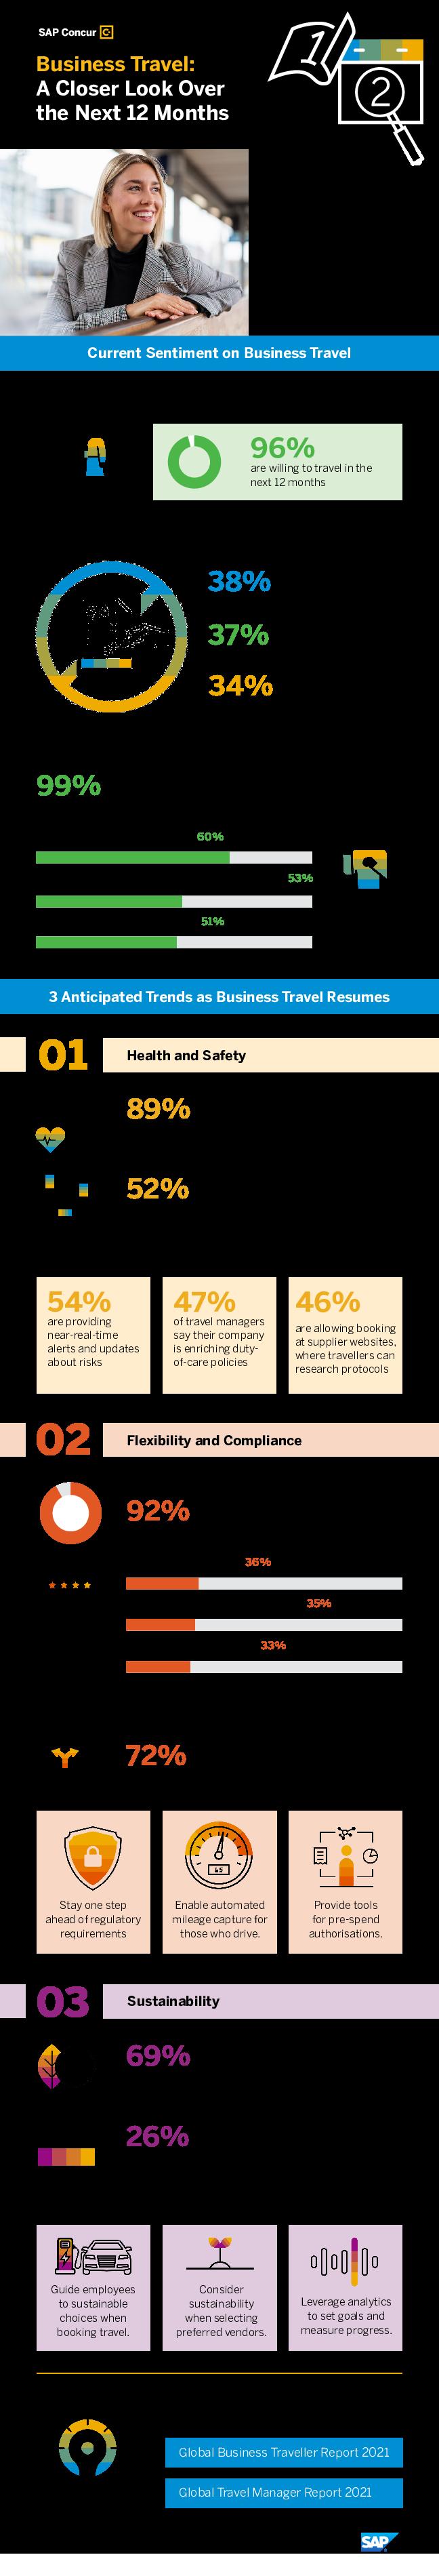 Thumb original infographic business travel a closer look ukent